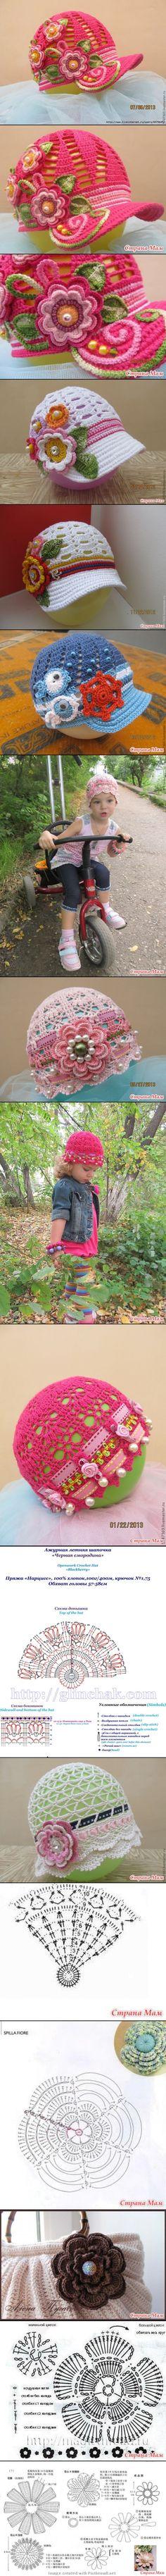 Kid hat crochet - created via http://pinthemall.net